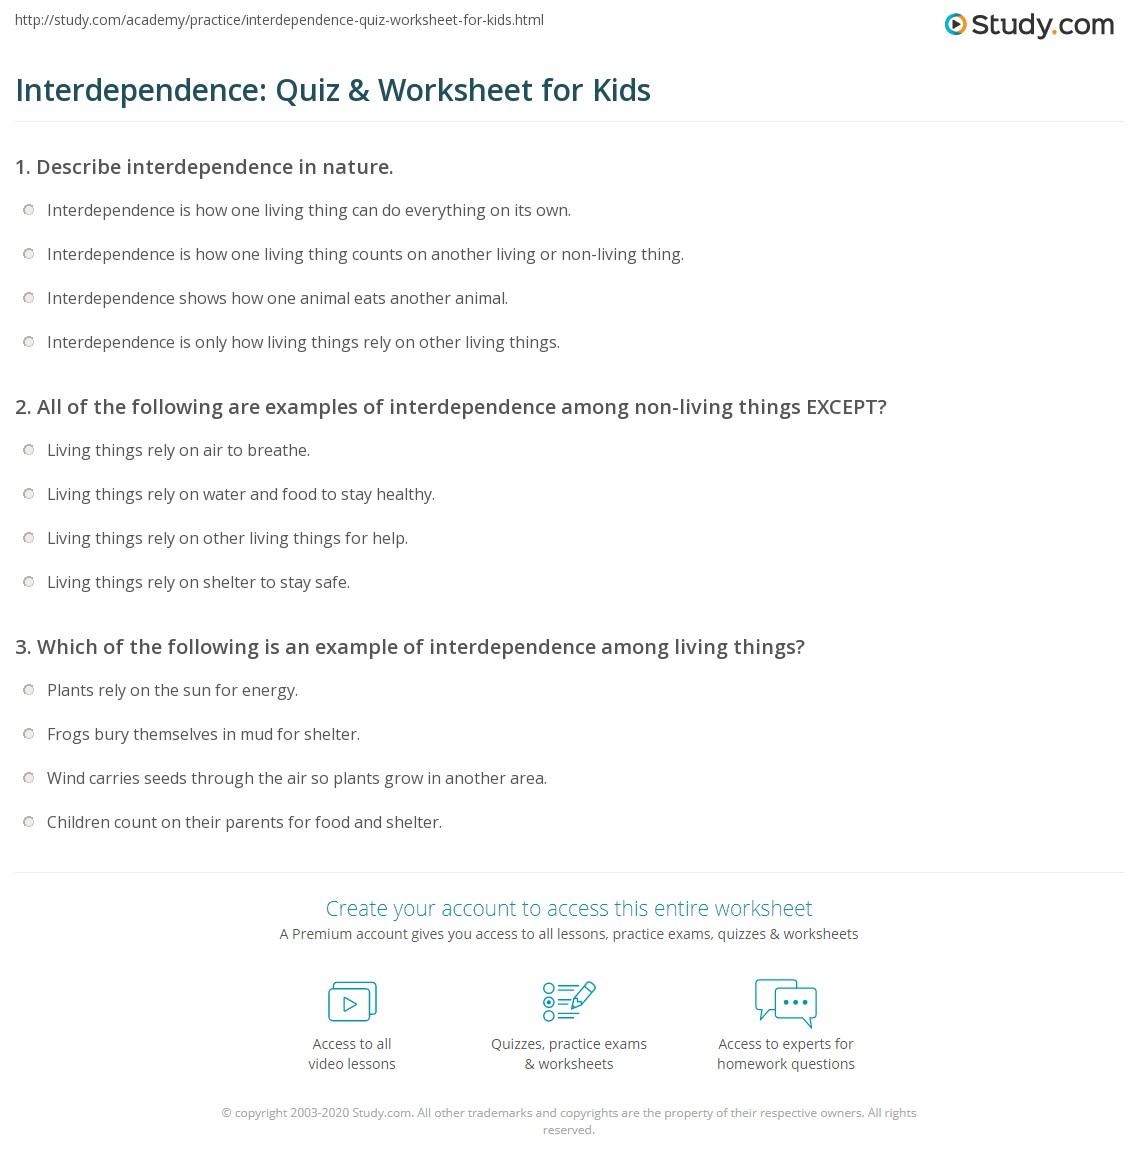 Interdependence Quiz Worksheet For Kids Study